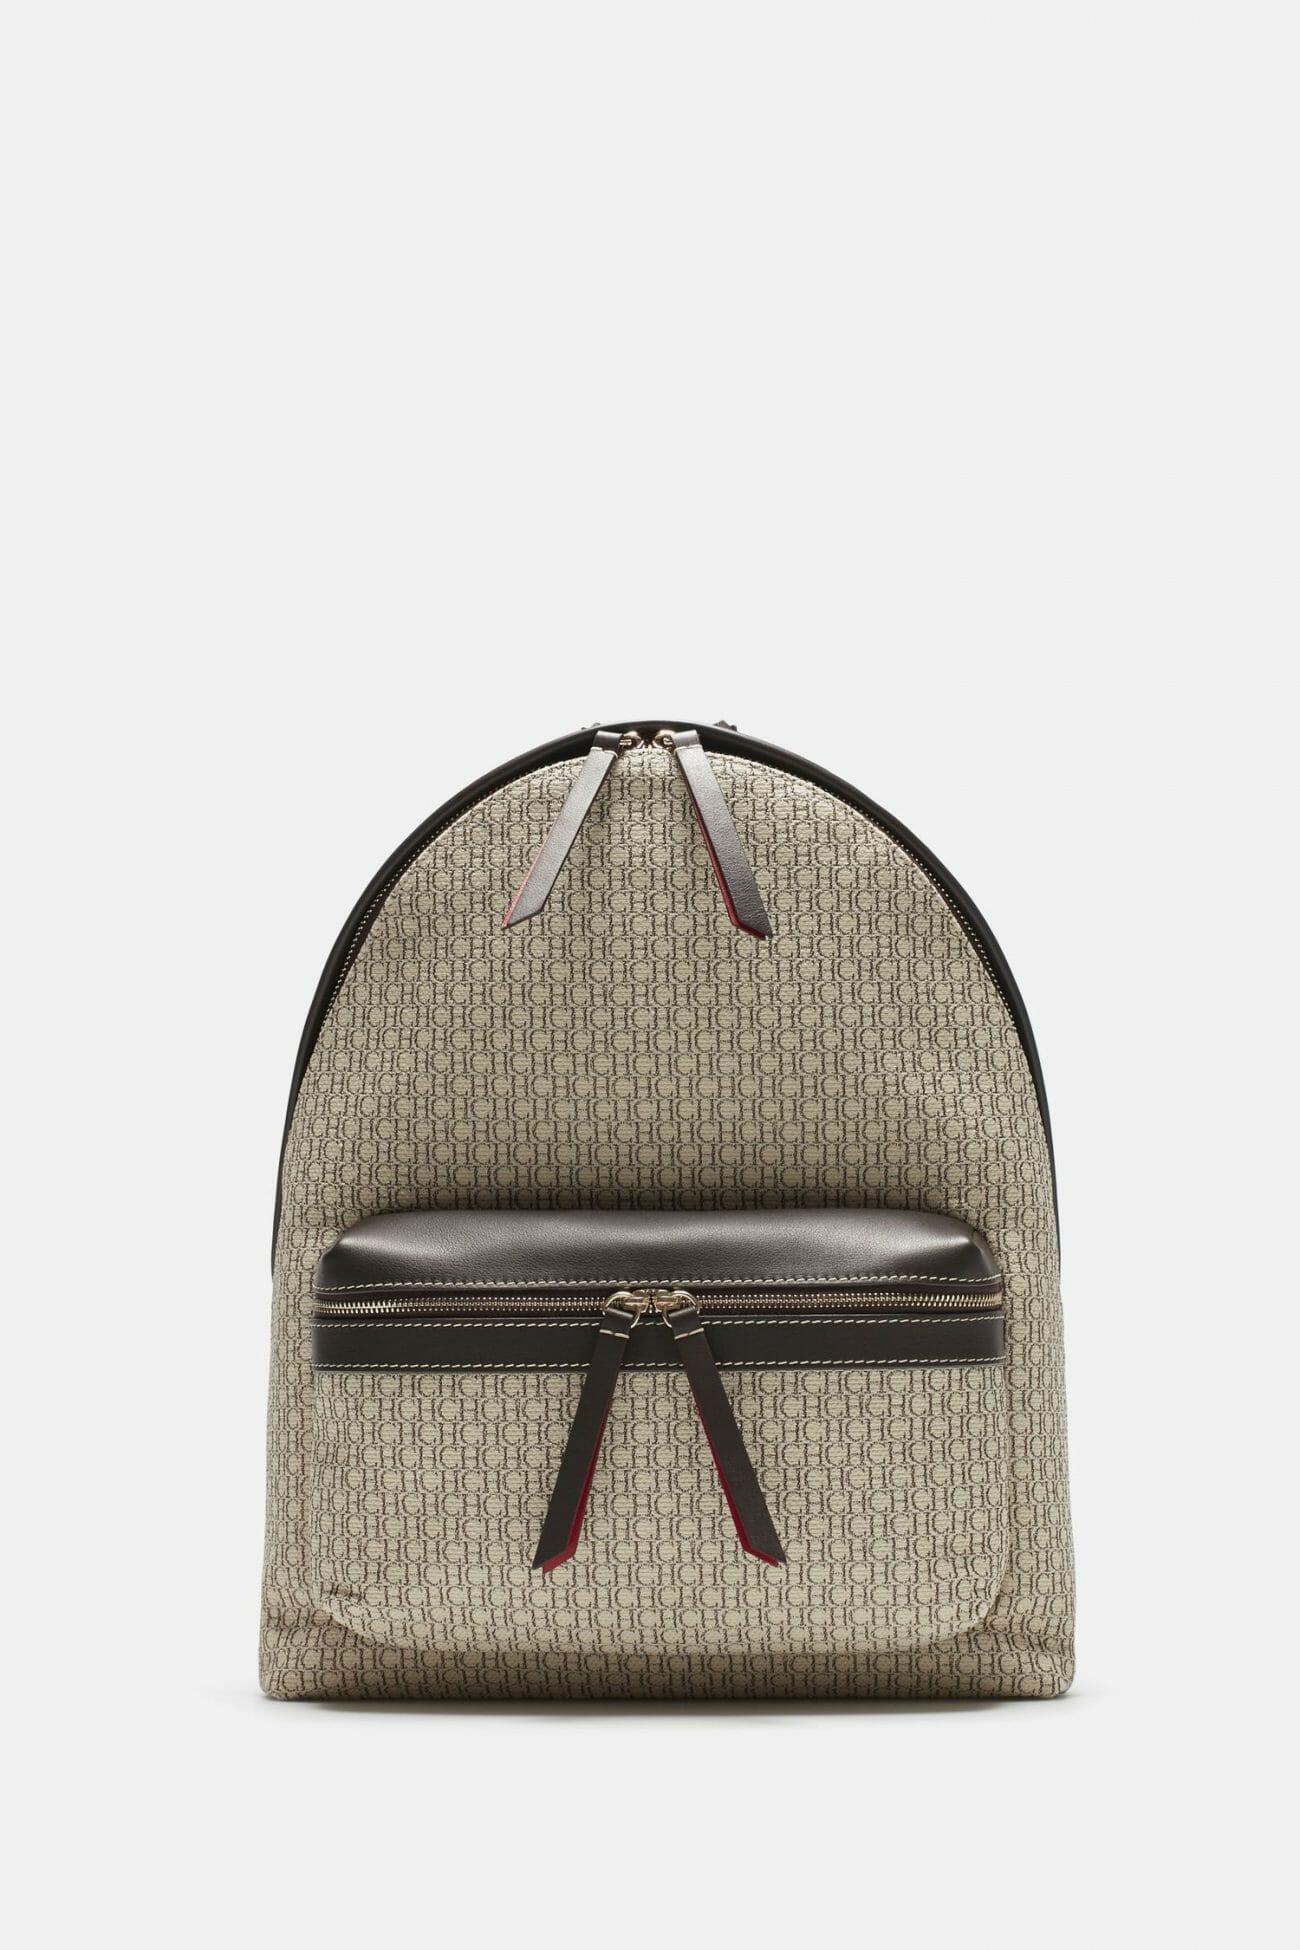 CH-Carolina-herrera-men-accessories-look-25